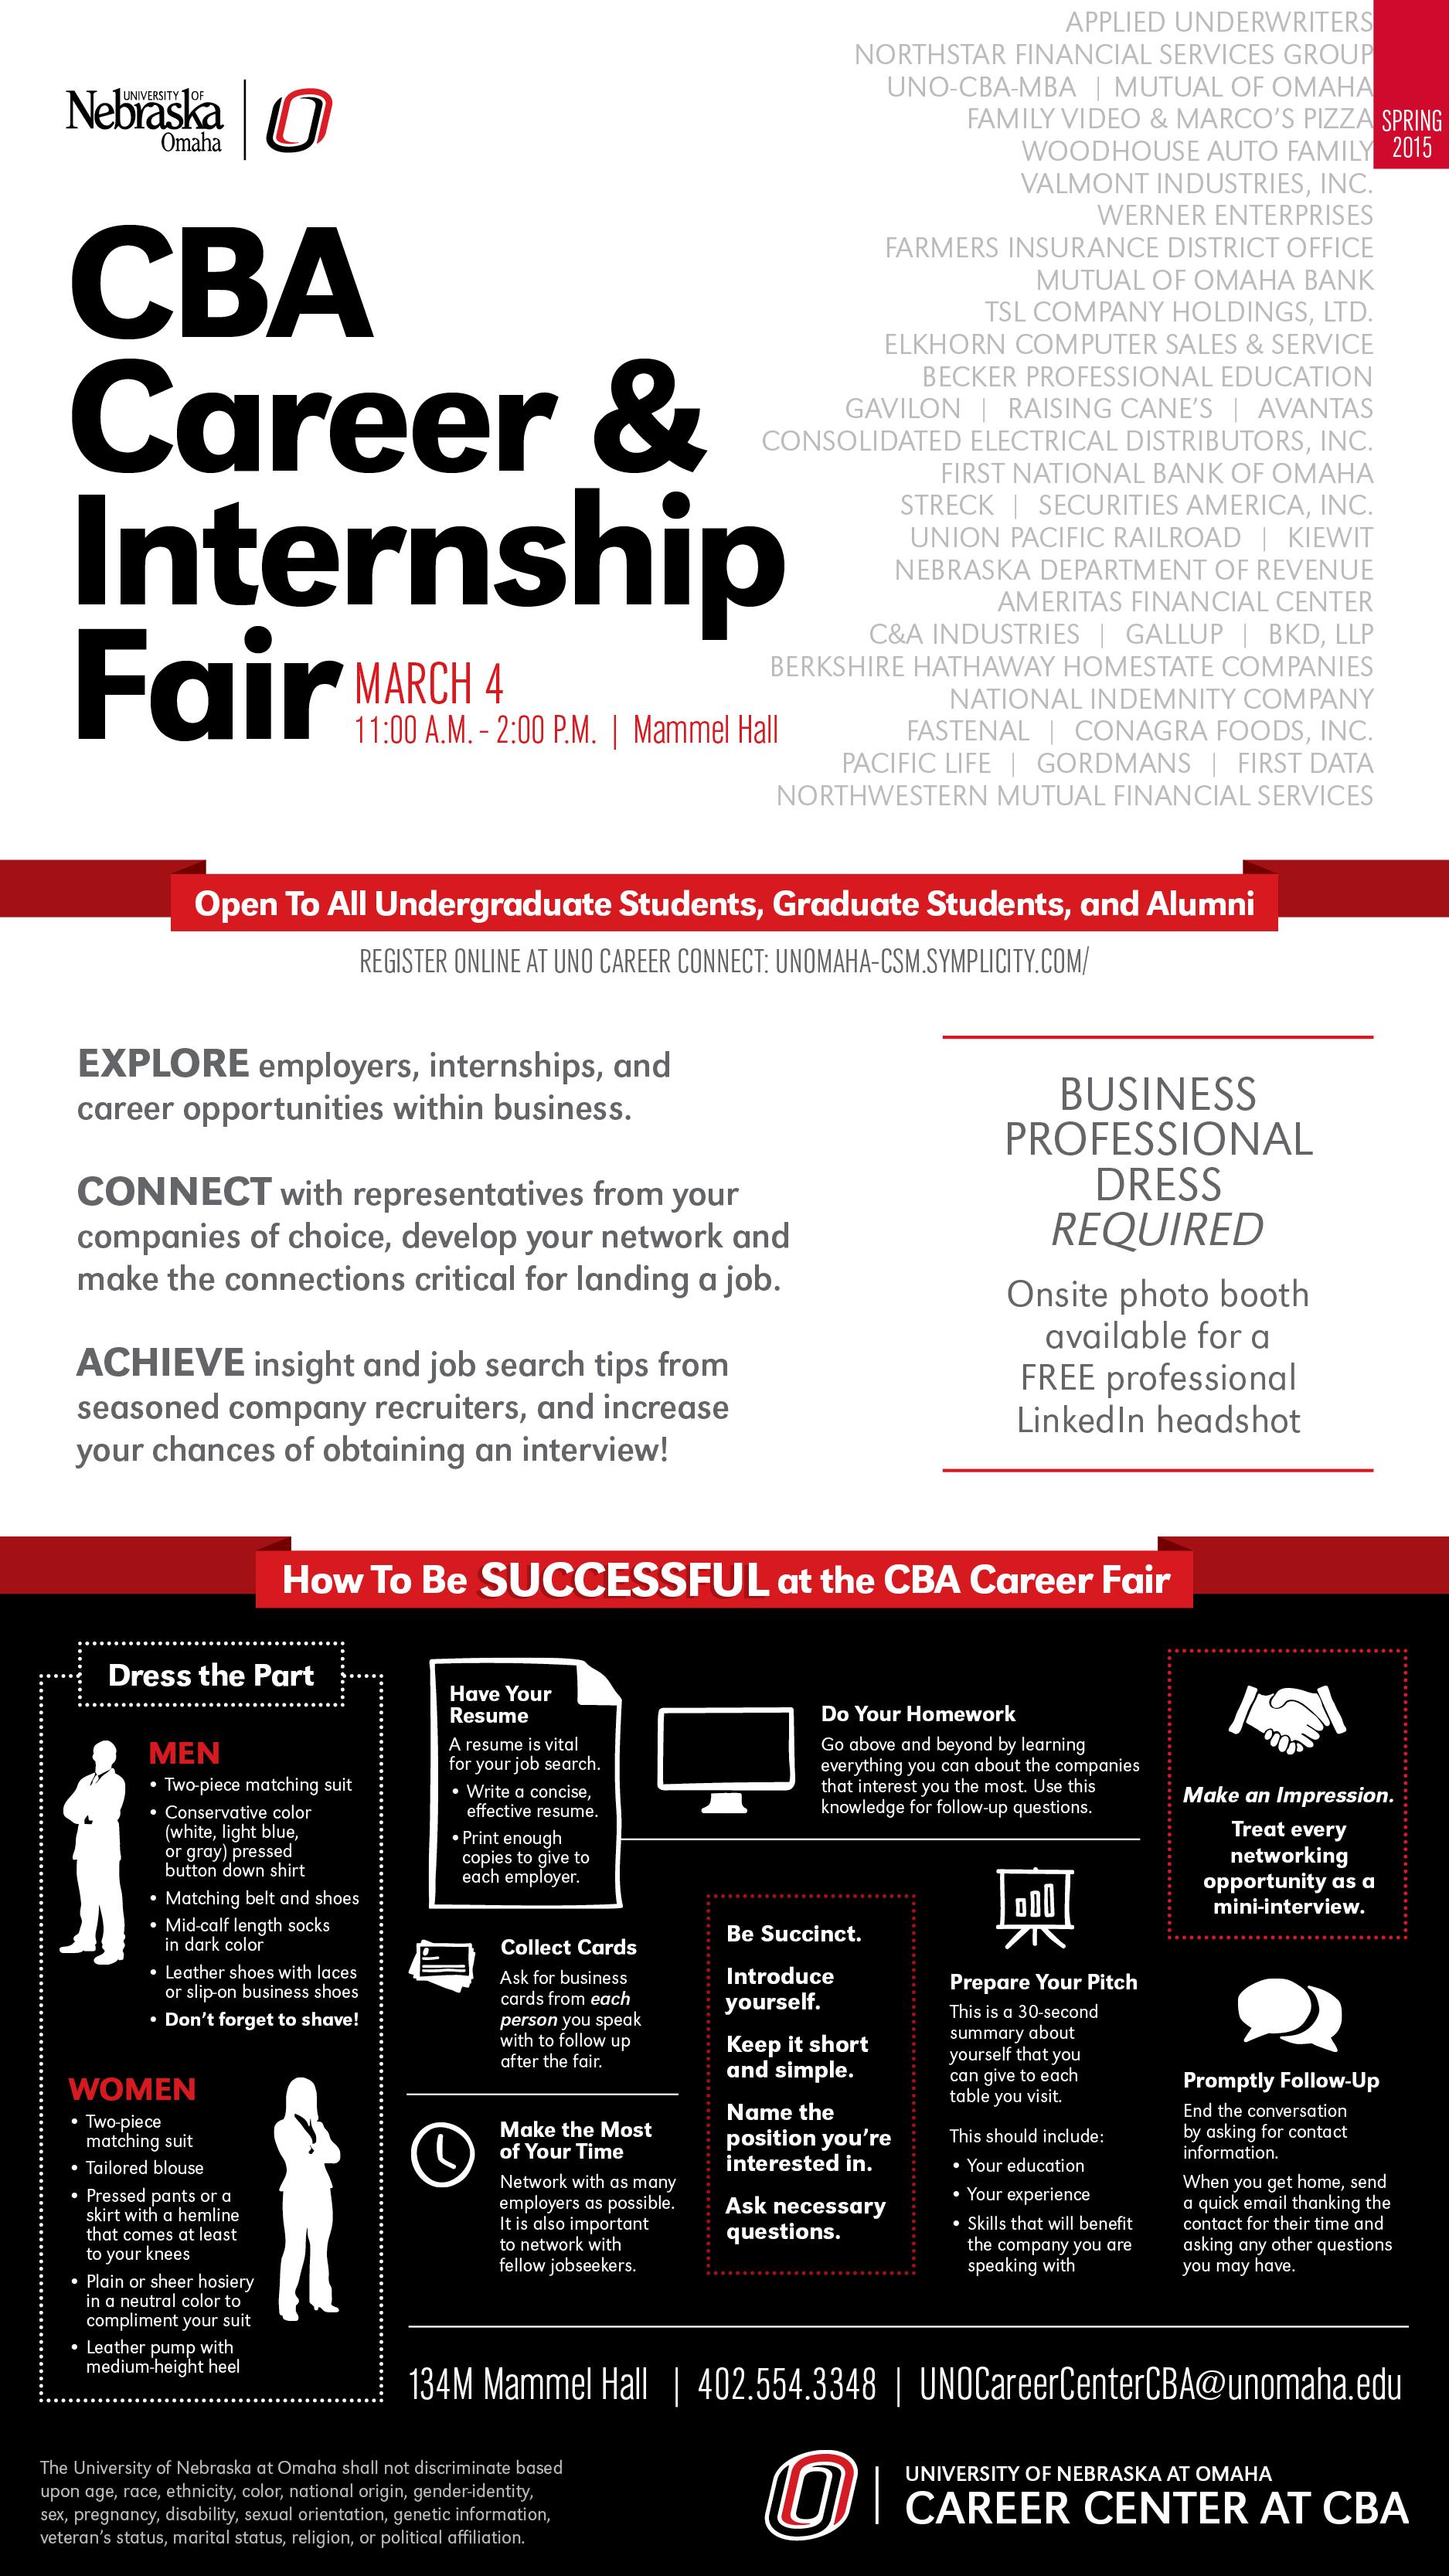 spring cba career internship fair college of business spring 2015 cba career internship fair